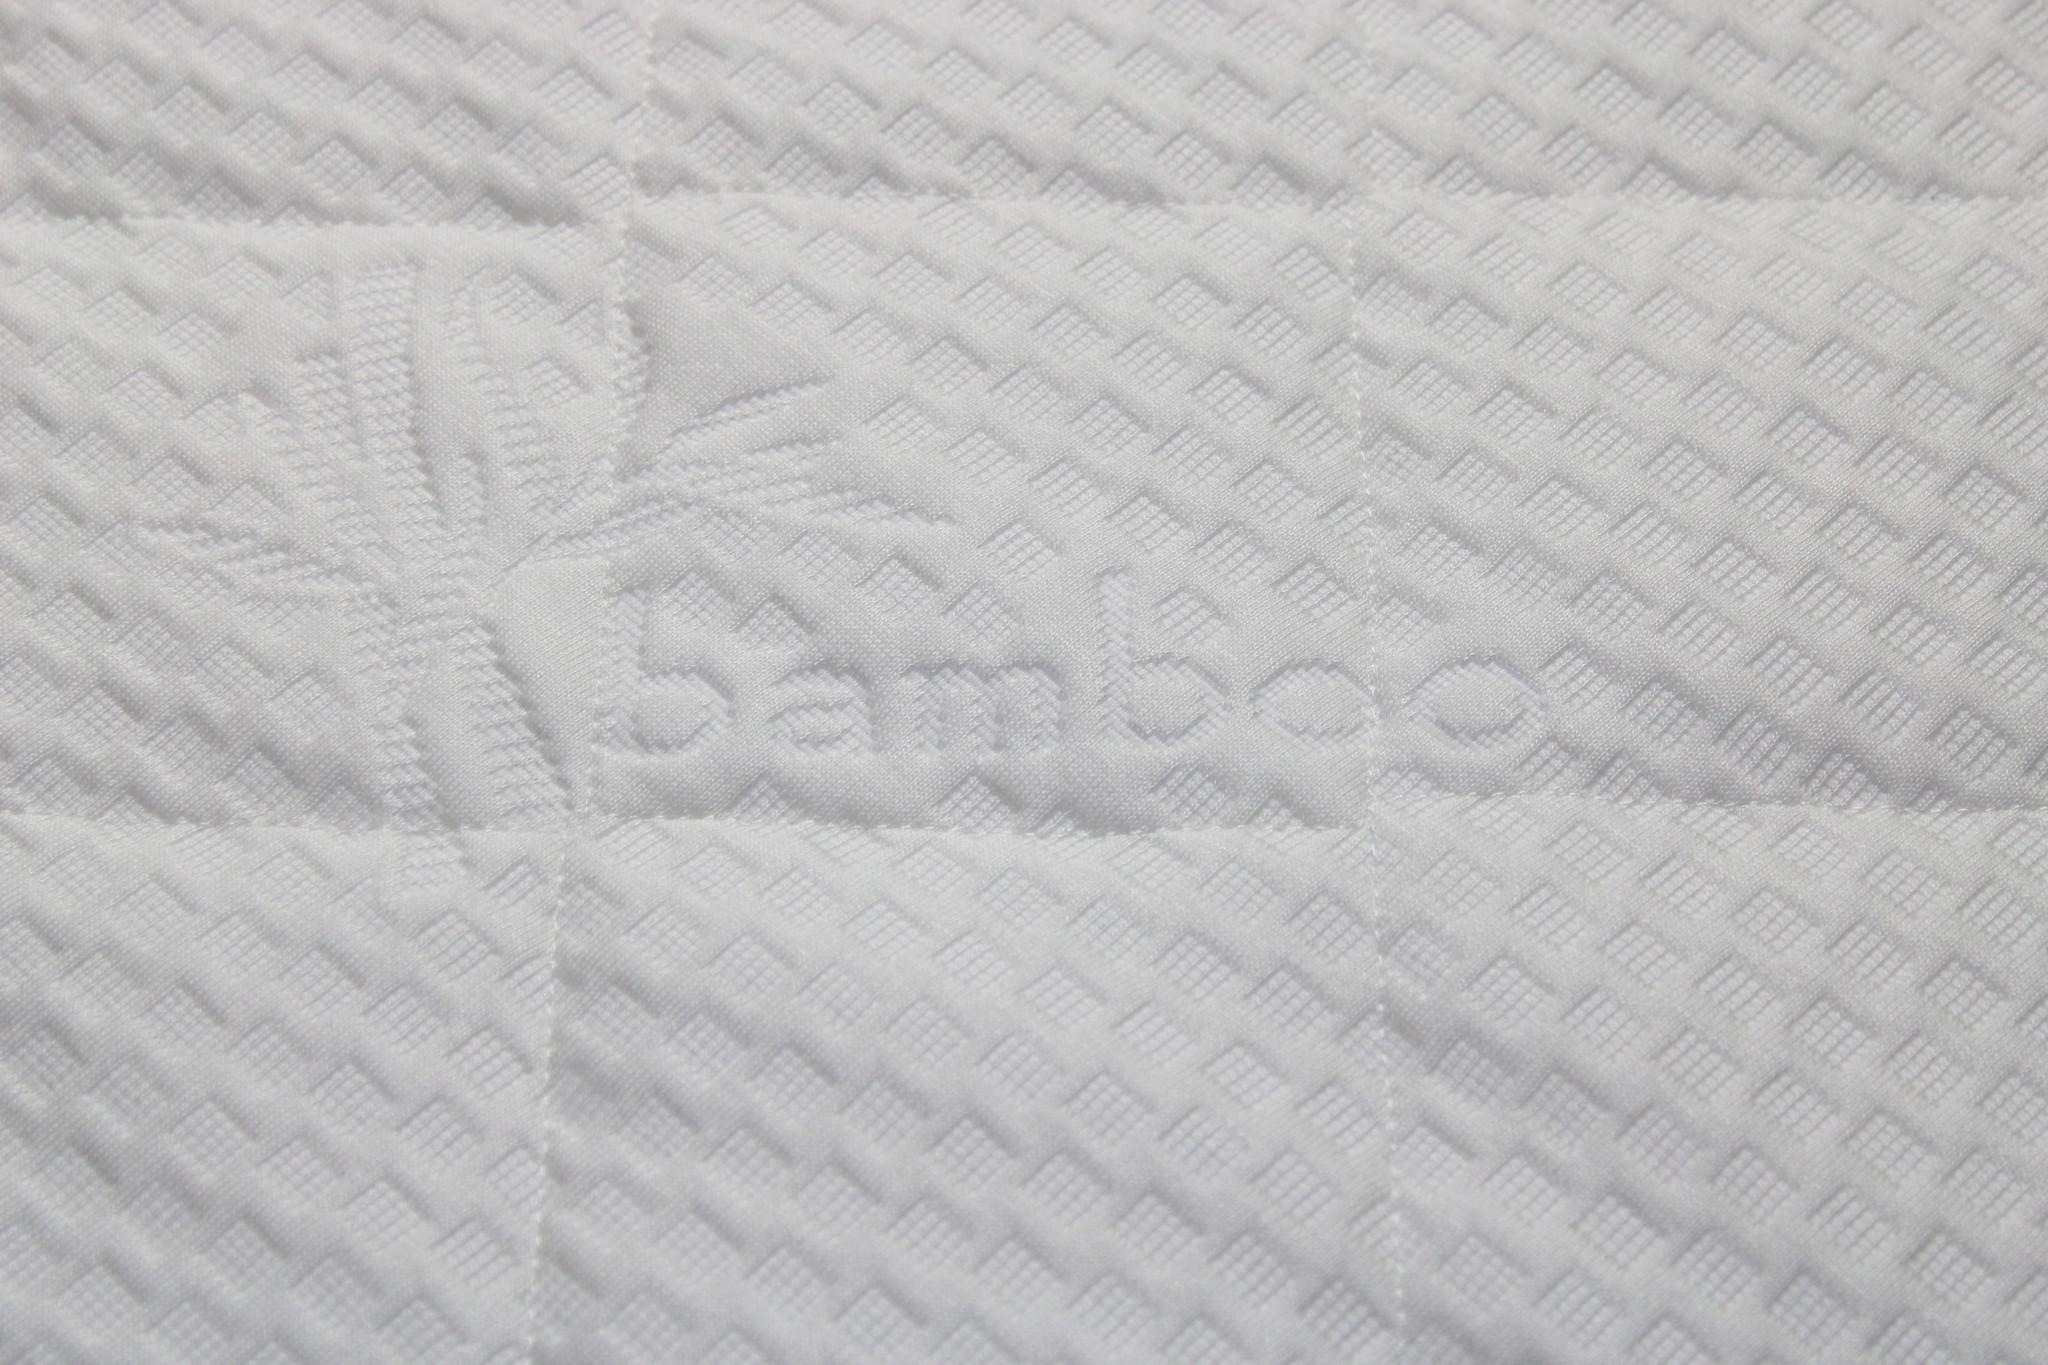 Sarpy Kindermatras 80x195 koudschuim HR55 bamboo